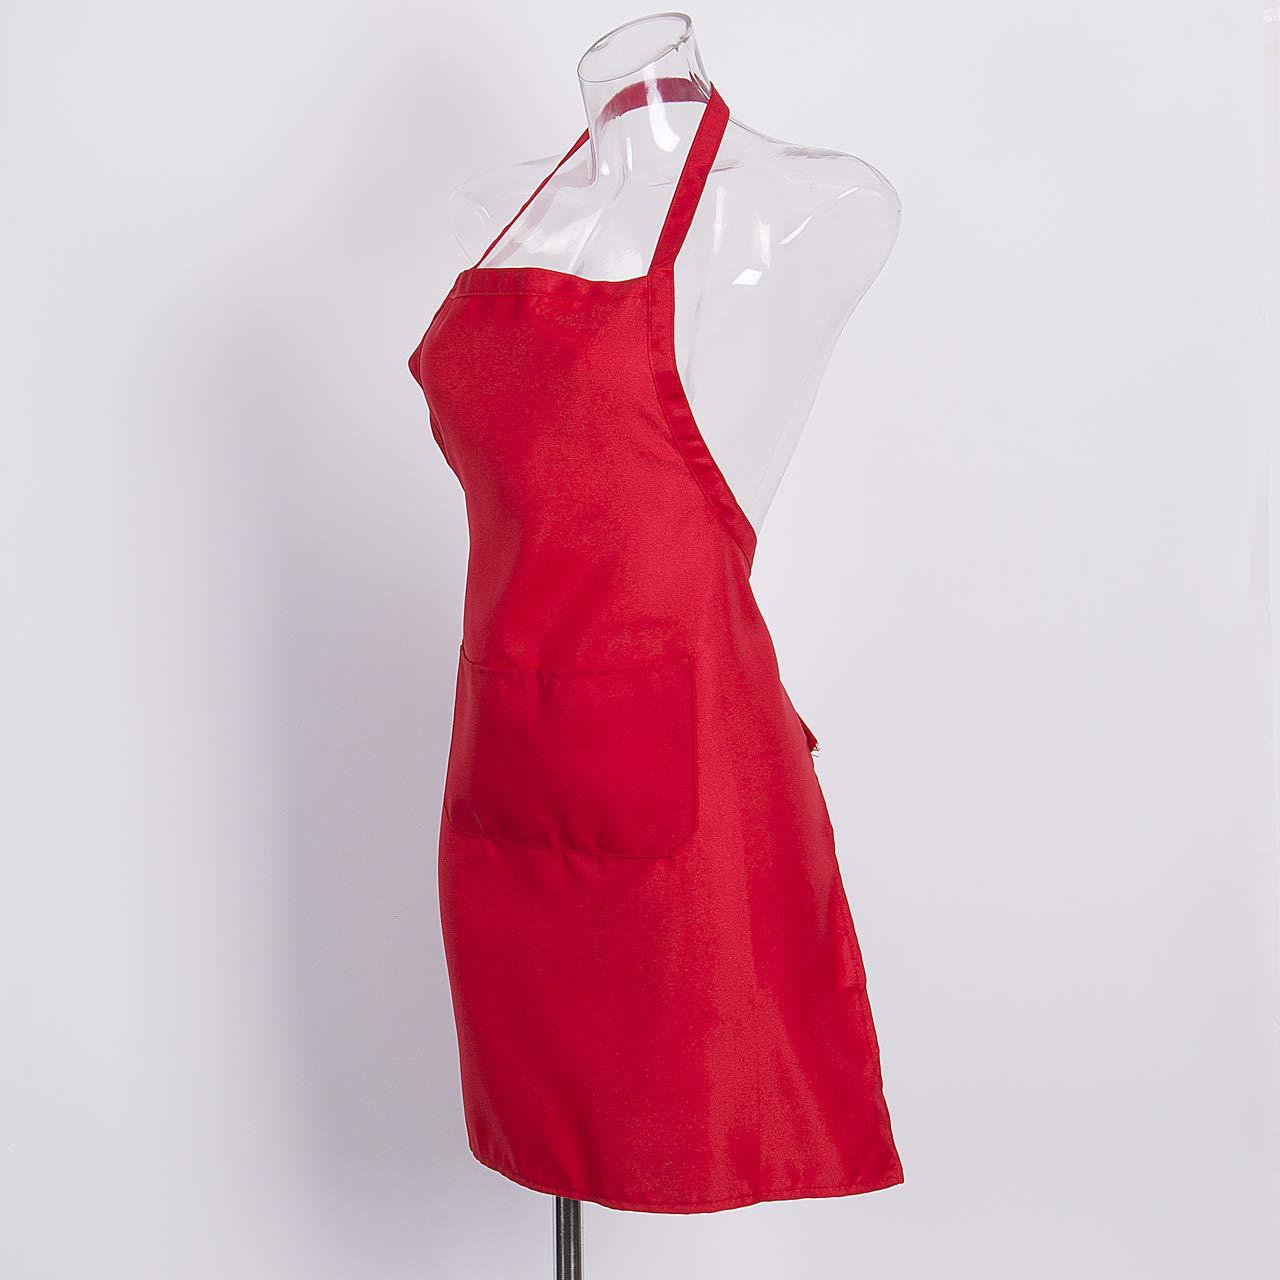 Adjustable Bib Apron Dress Men Women Kitchen Restaurant Chef Classic Cooking Bib